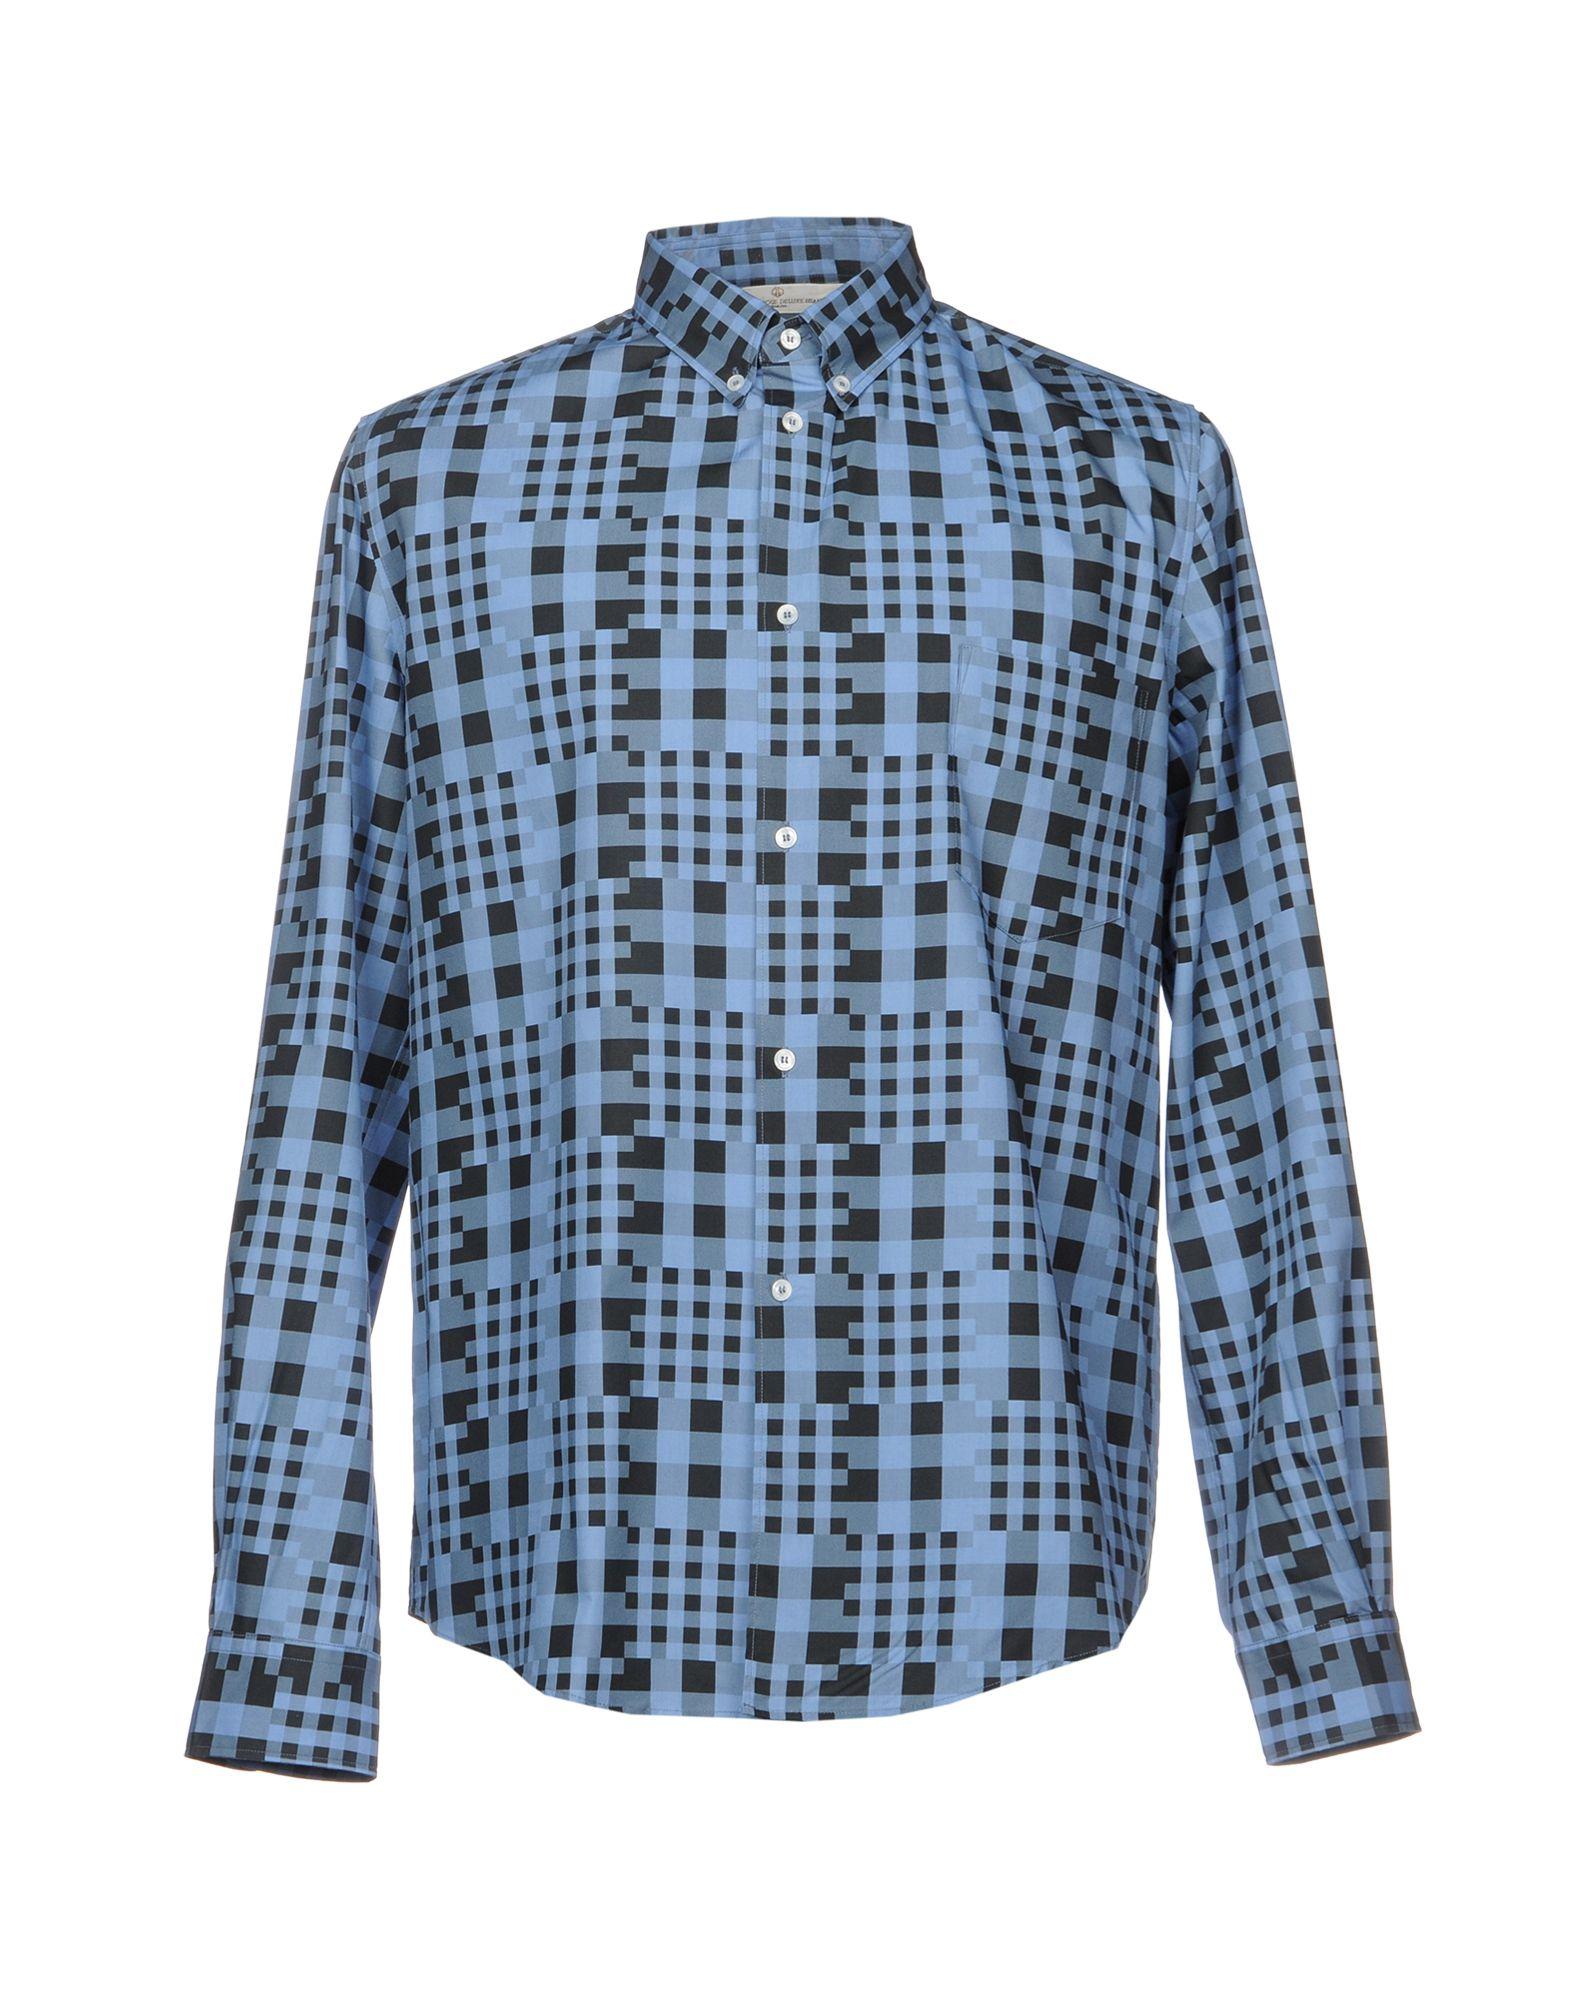 Camicia Fantasia Golden Goose Deluxe Brand Uomo - Acquista online su